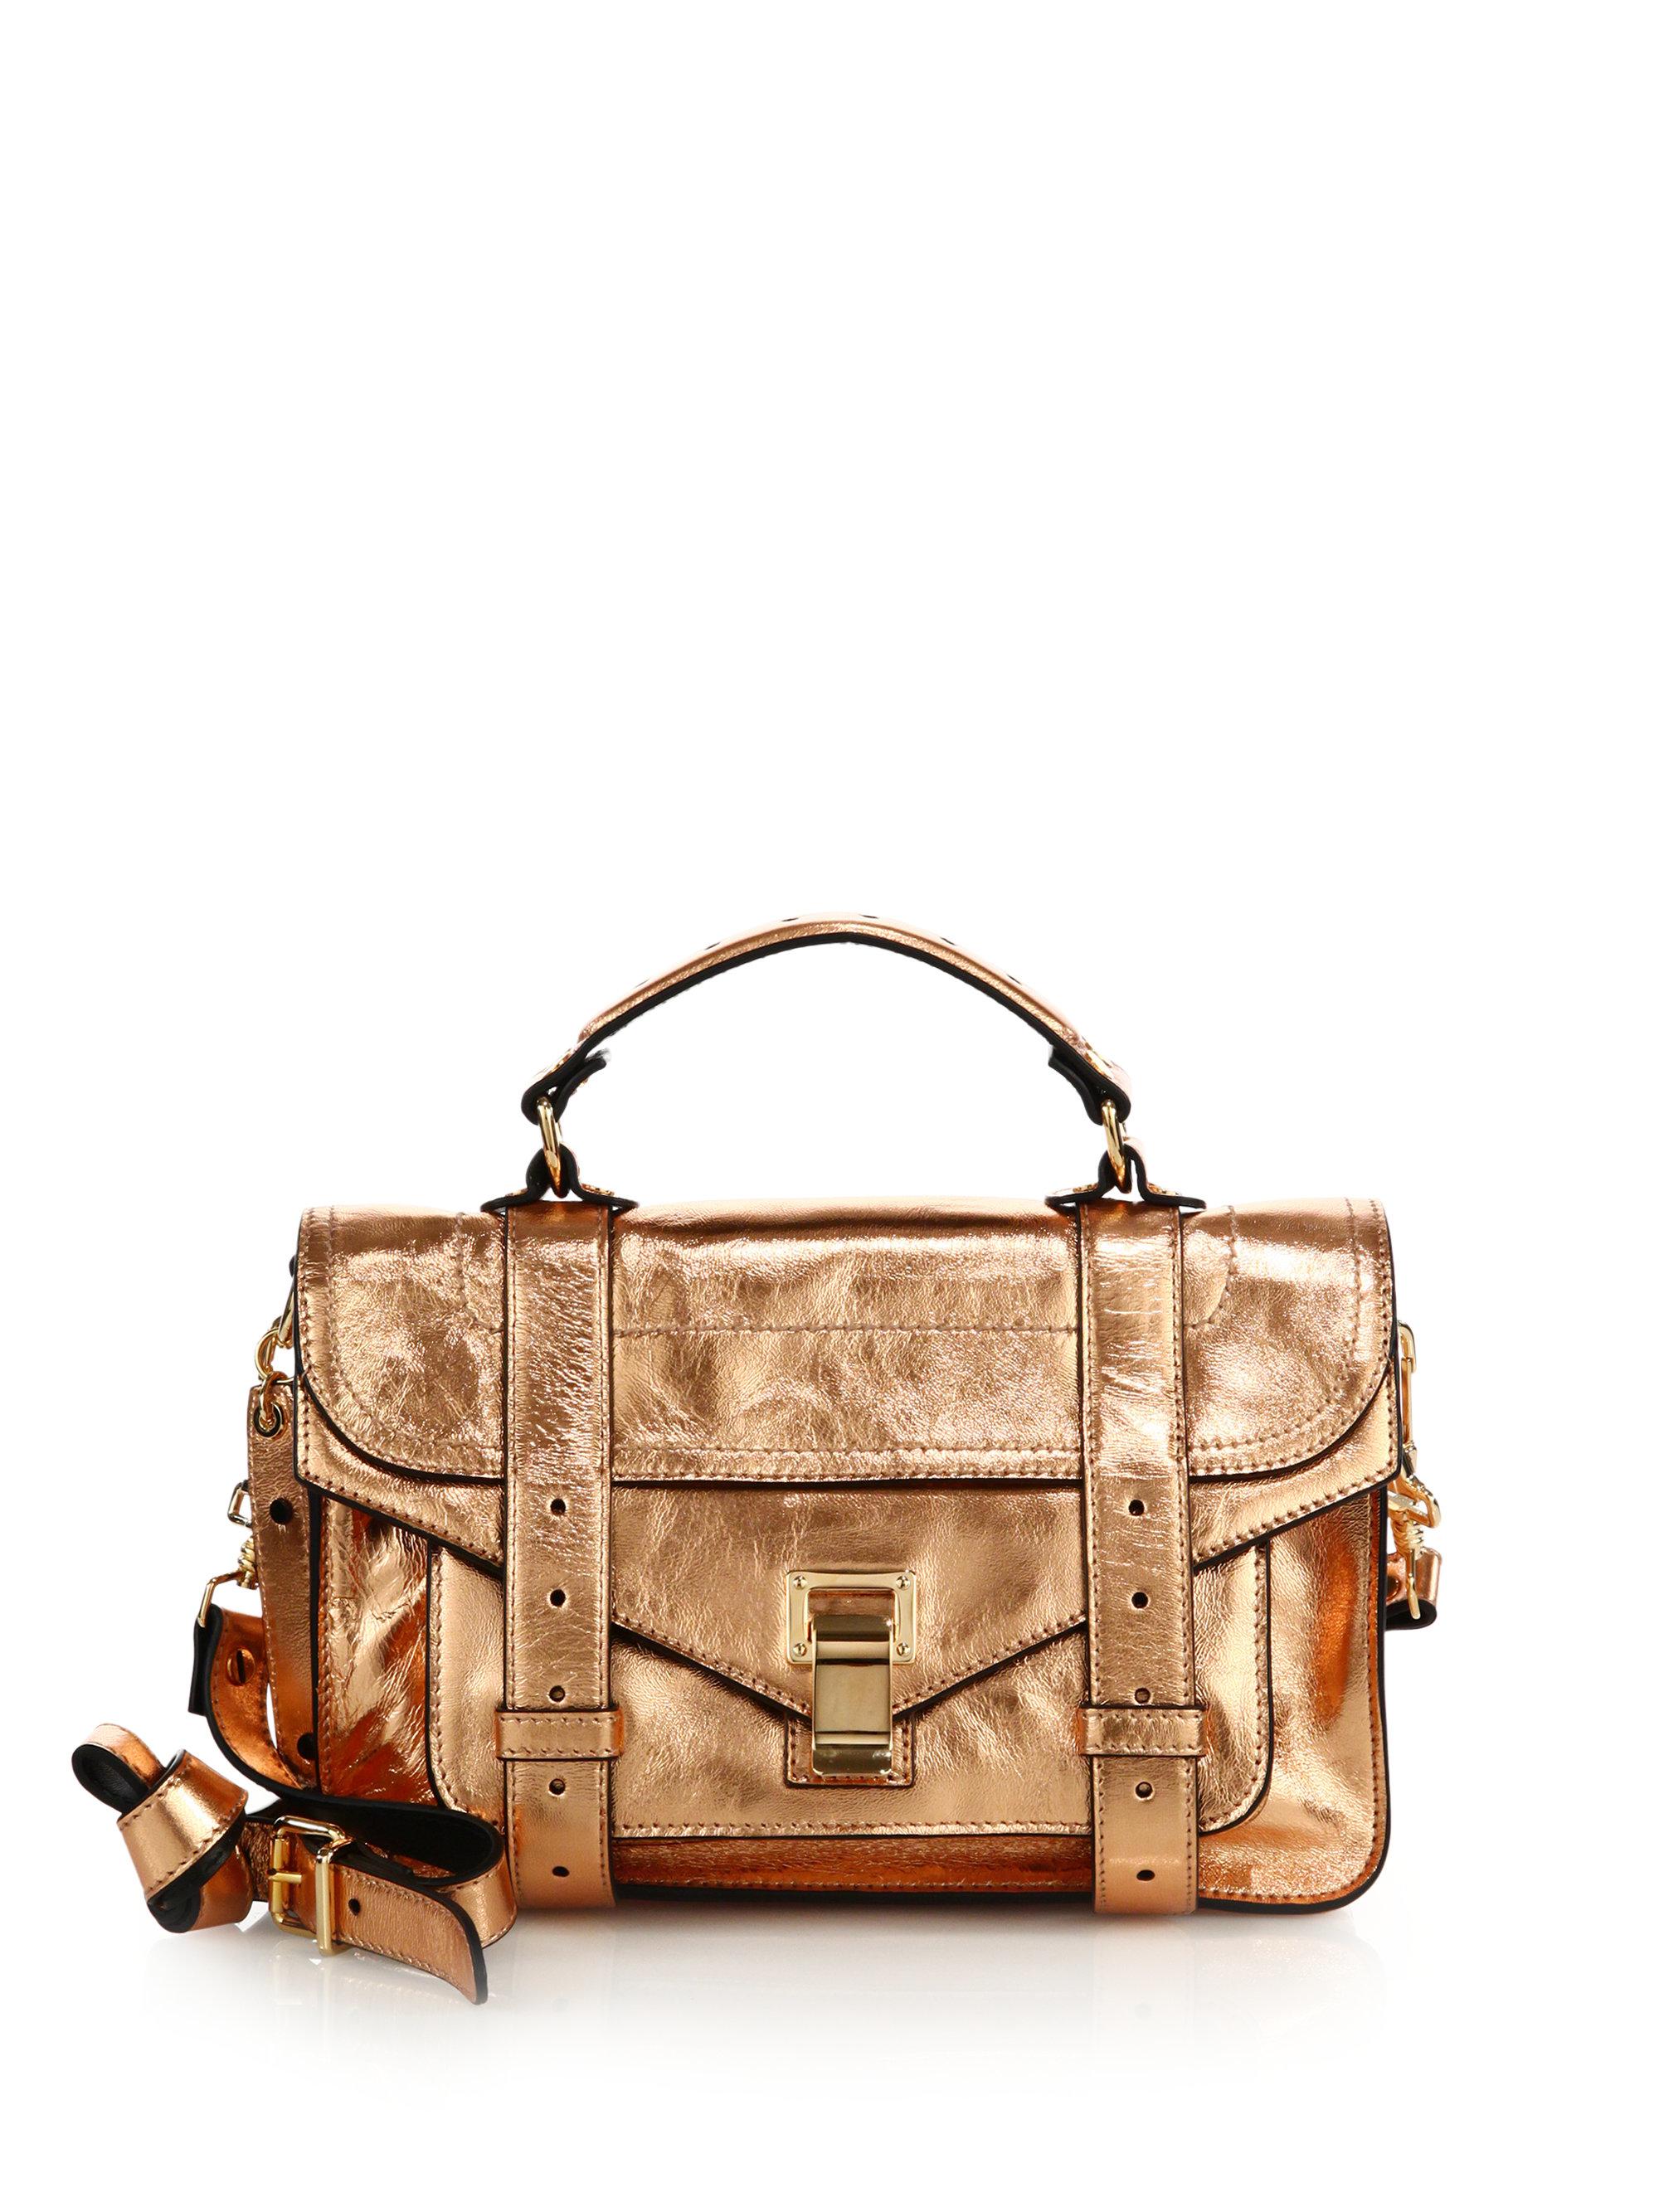 Proenza Schouler PS1+ Tiny Metallic Leather Satchel Bag hVoB9ss